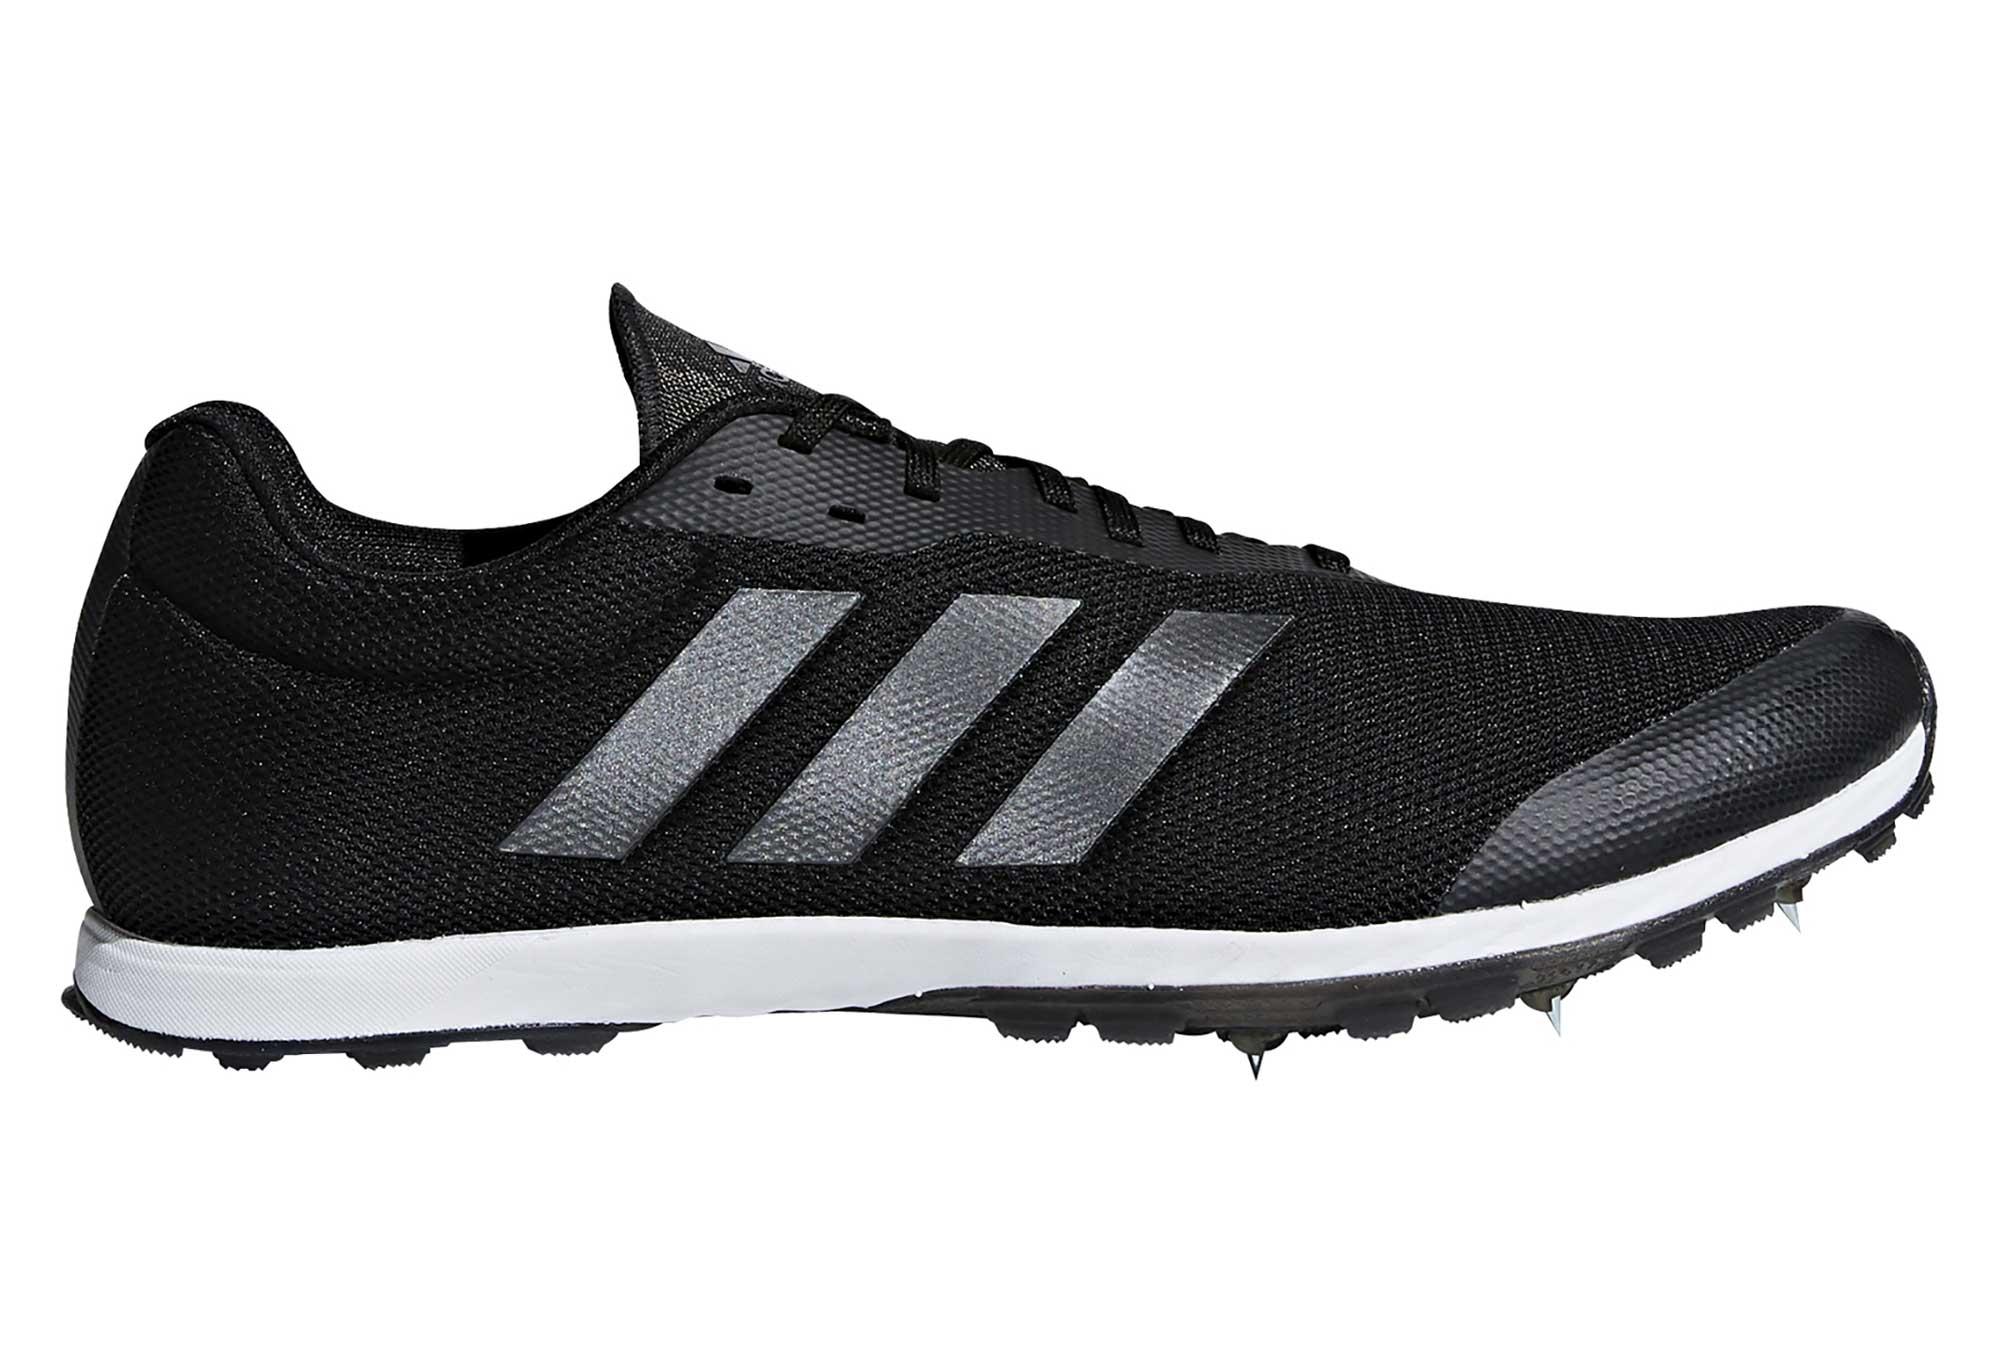 D'athlétisme Chaussures Xcs Running Adidas Noir UzqMVSpG